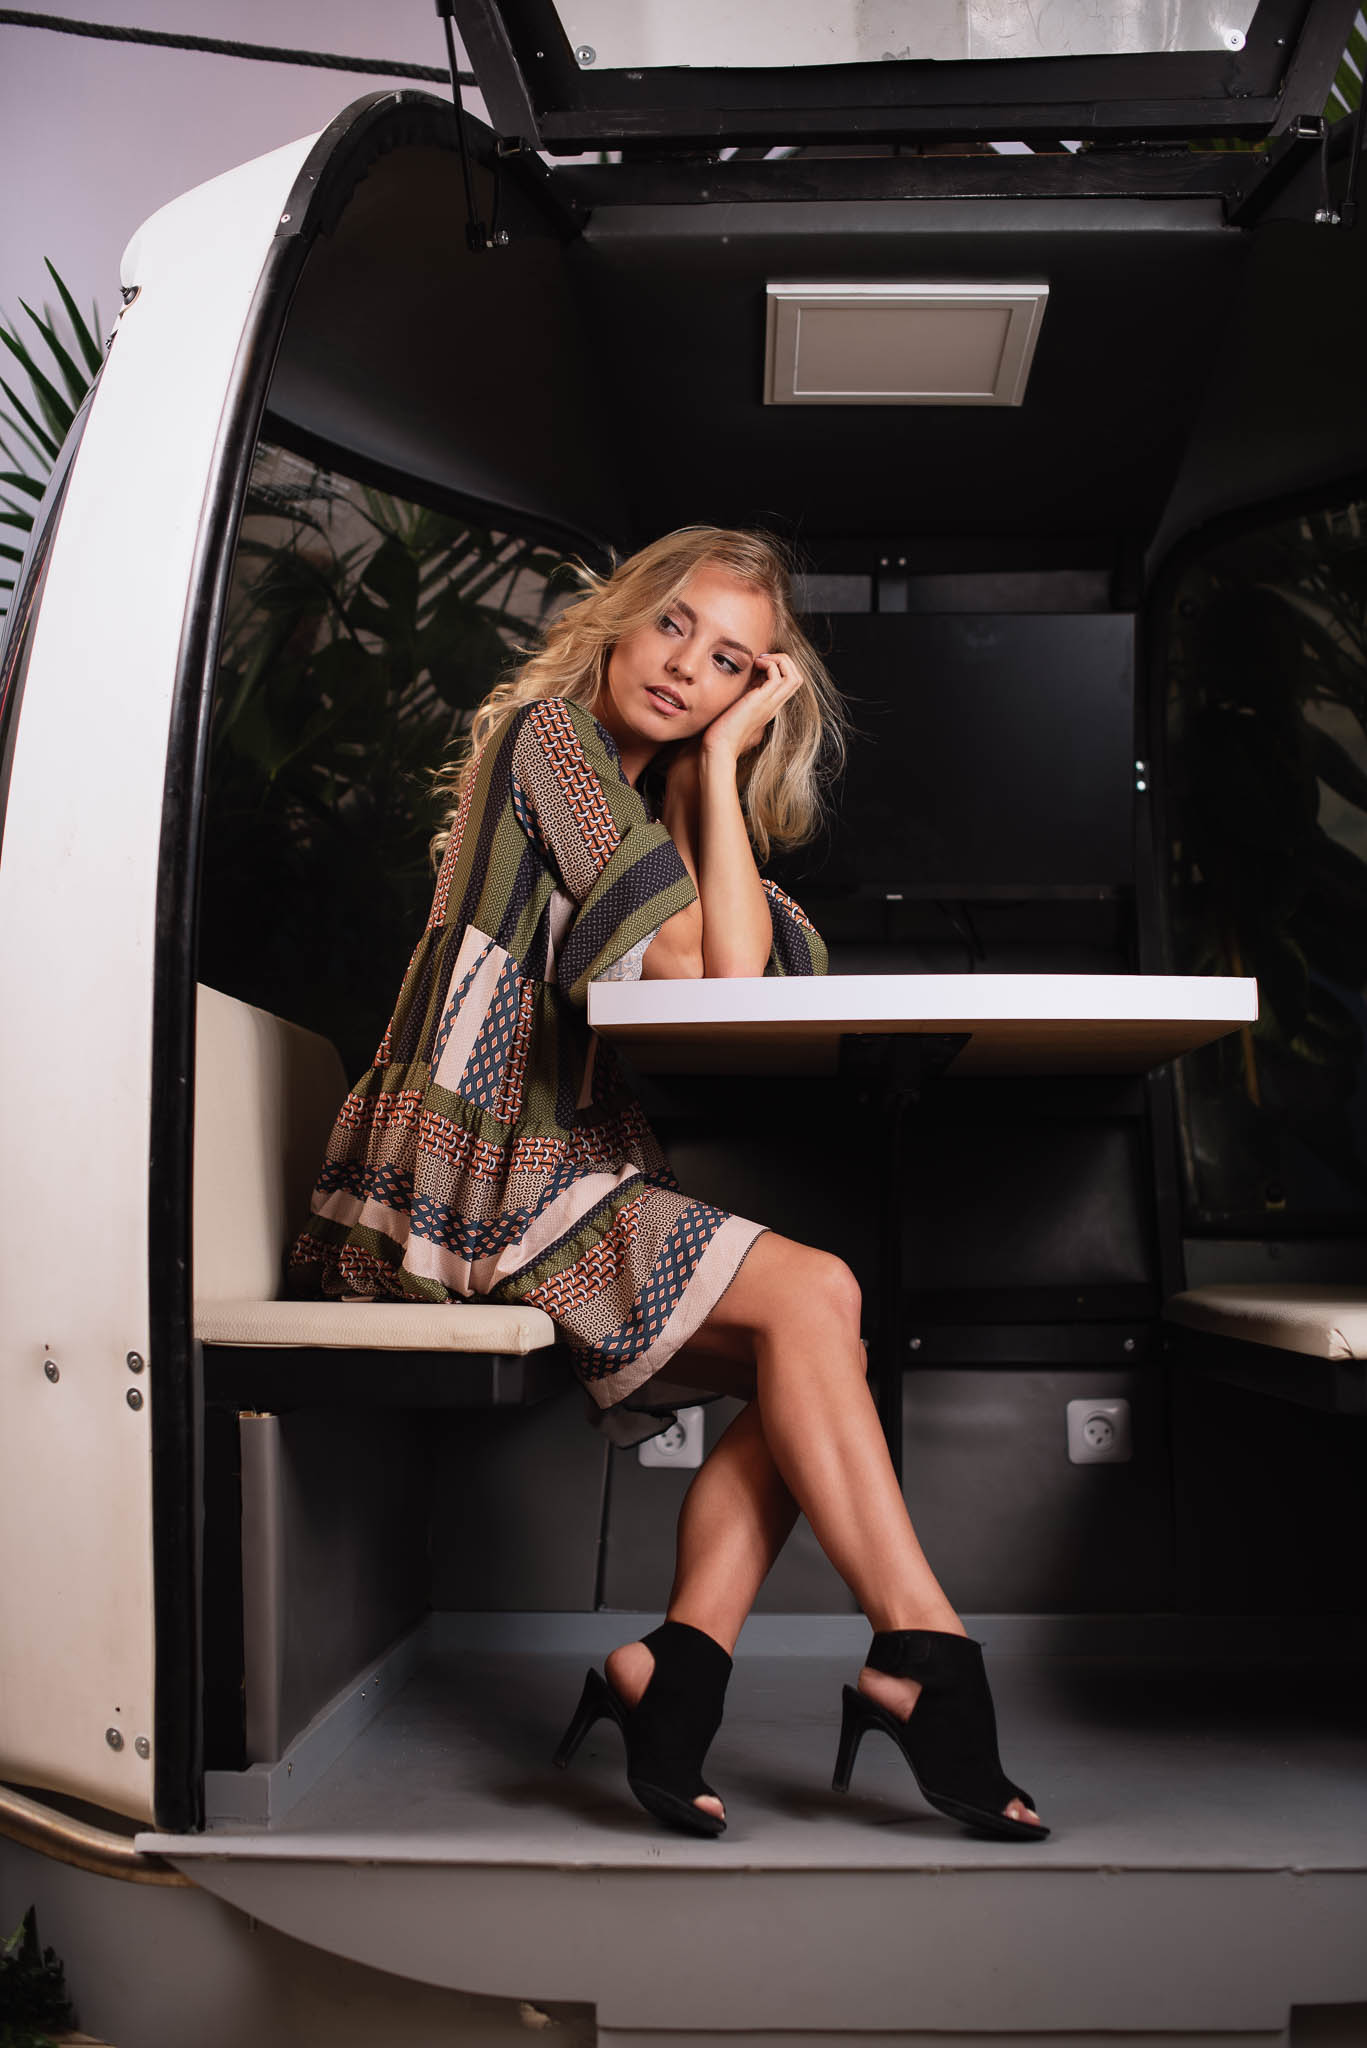 fashion photography in swiss gondola studio lighting blonde in dress and heels